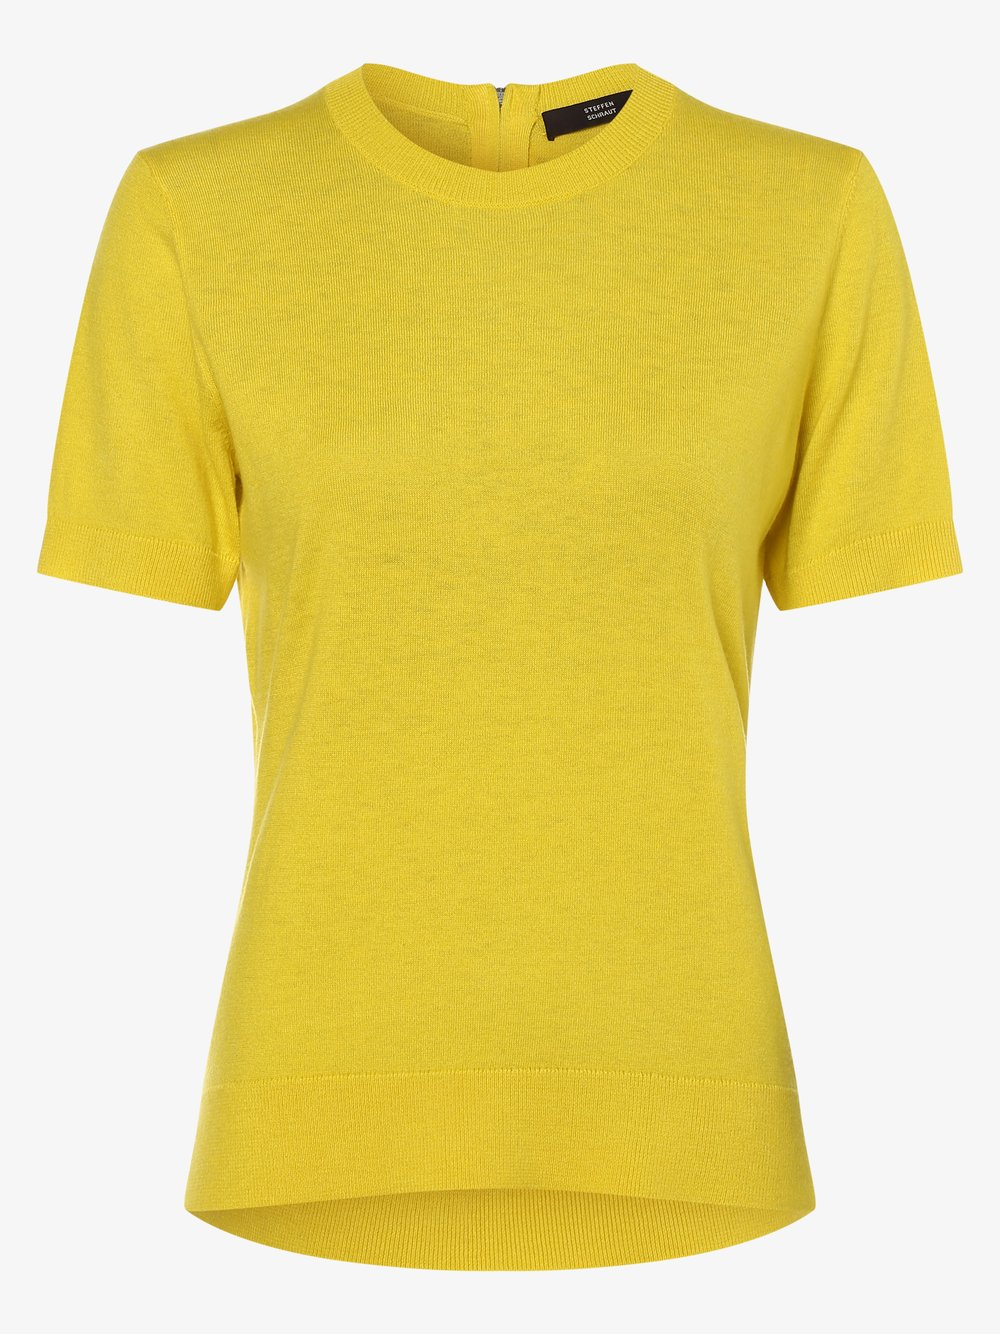 STEFFEN SCHRAUT – Sweter damski z dodatkiem kaszmiru, żółty Van Graaf 462228-0001